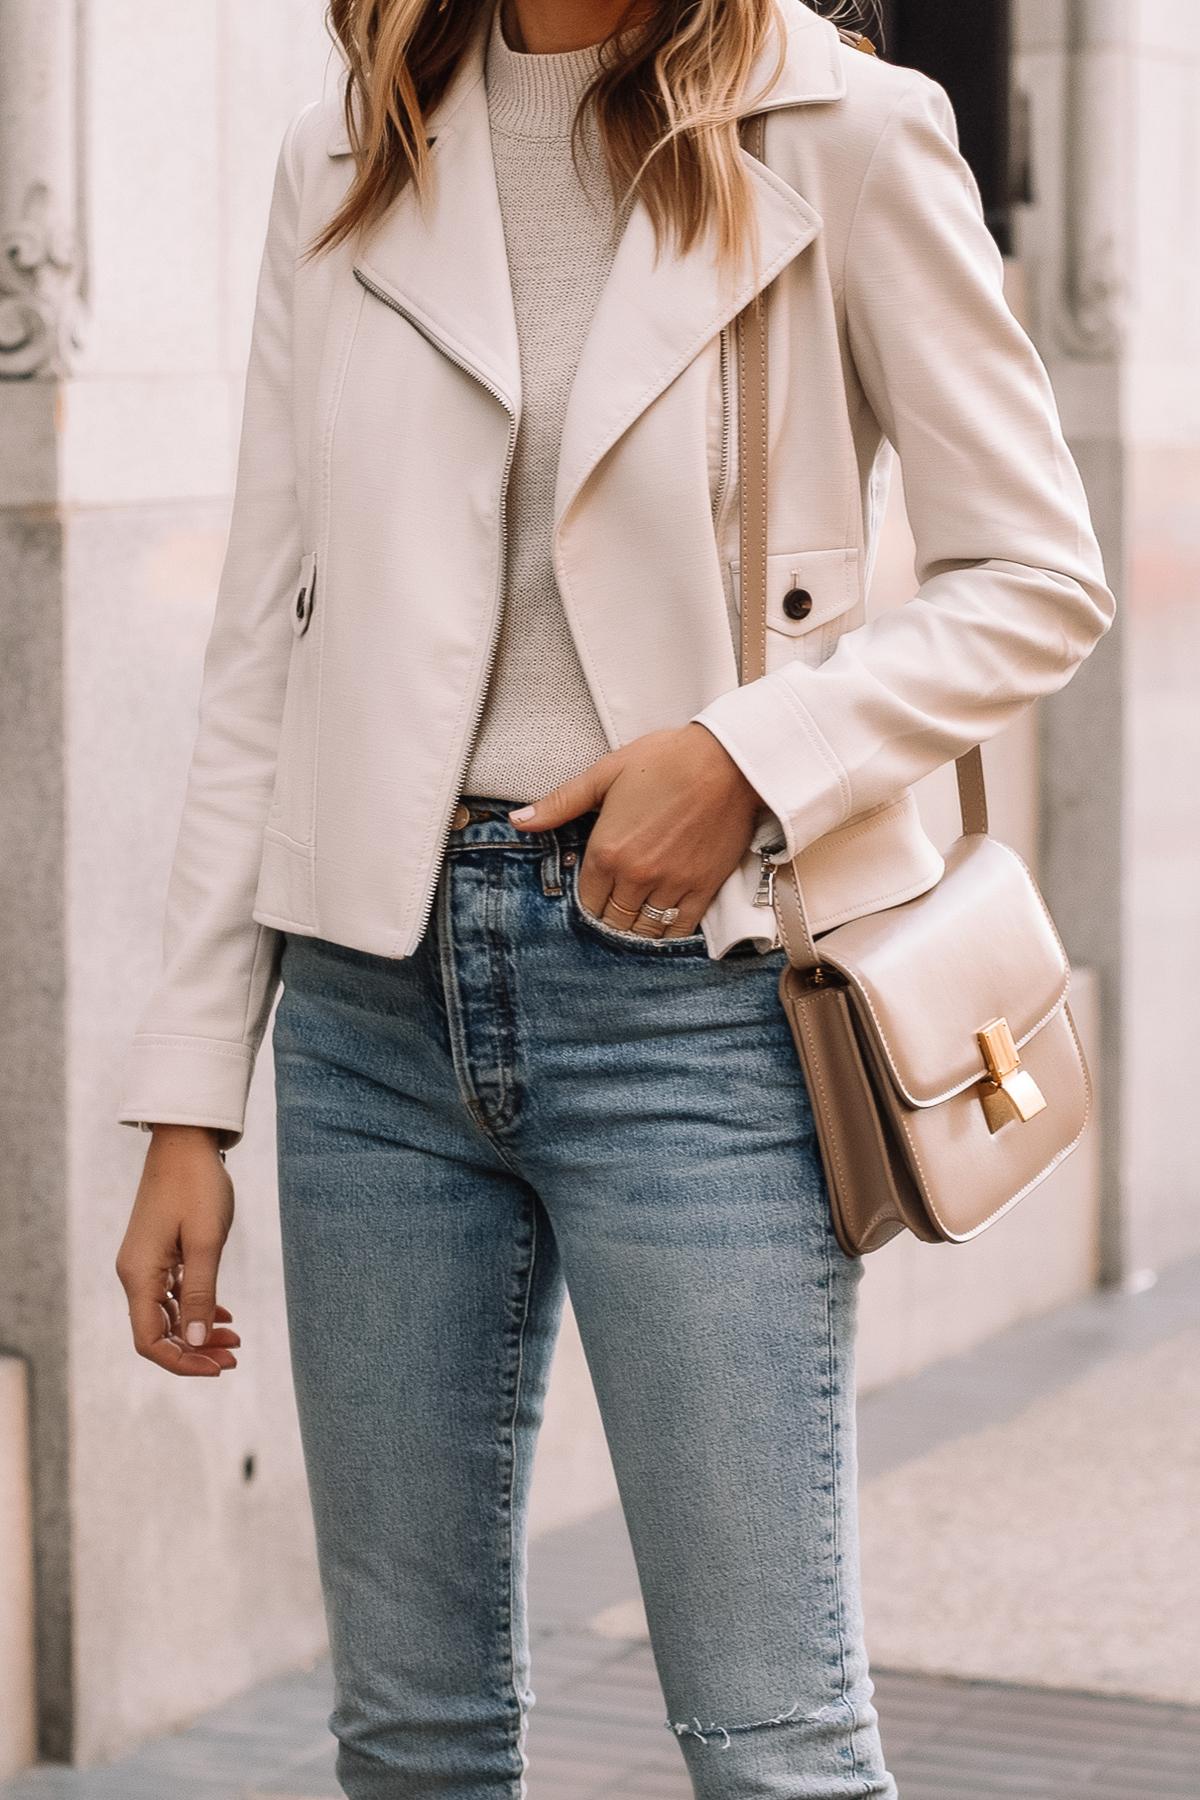 Fashion Jackson Wearing Ann Taylor Beige Moto Jacket Denim Skinny Jeans Beige Celine Box Bag